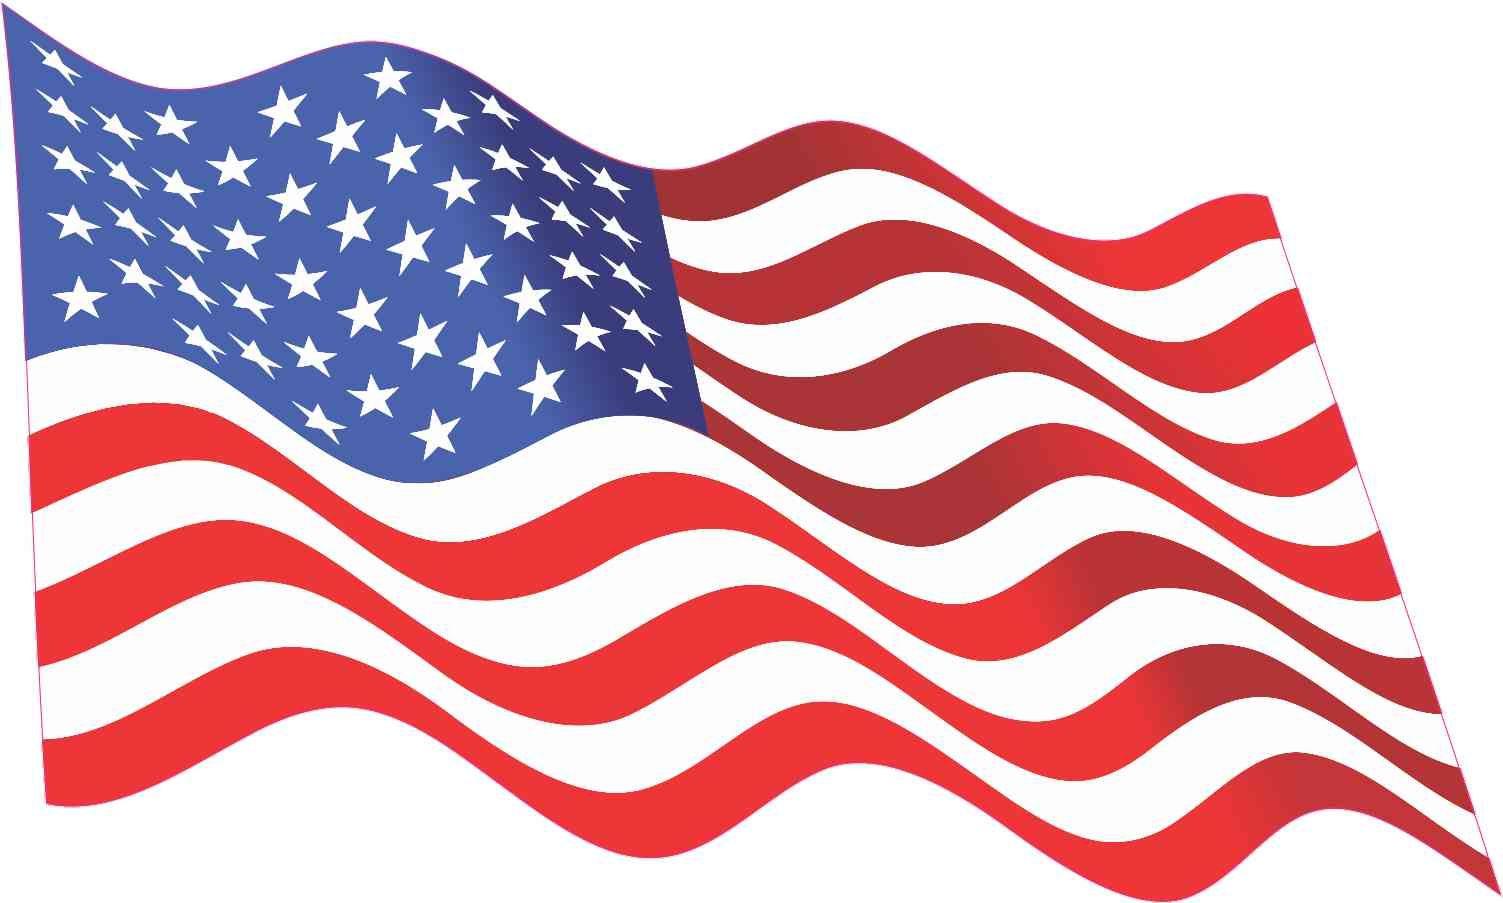 10in x 6in Waving American Flag Sticker Decal Stickers Window Vinyl Decals